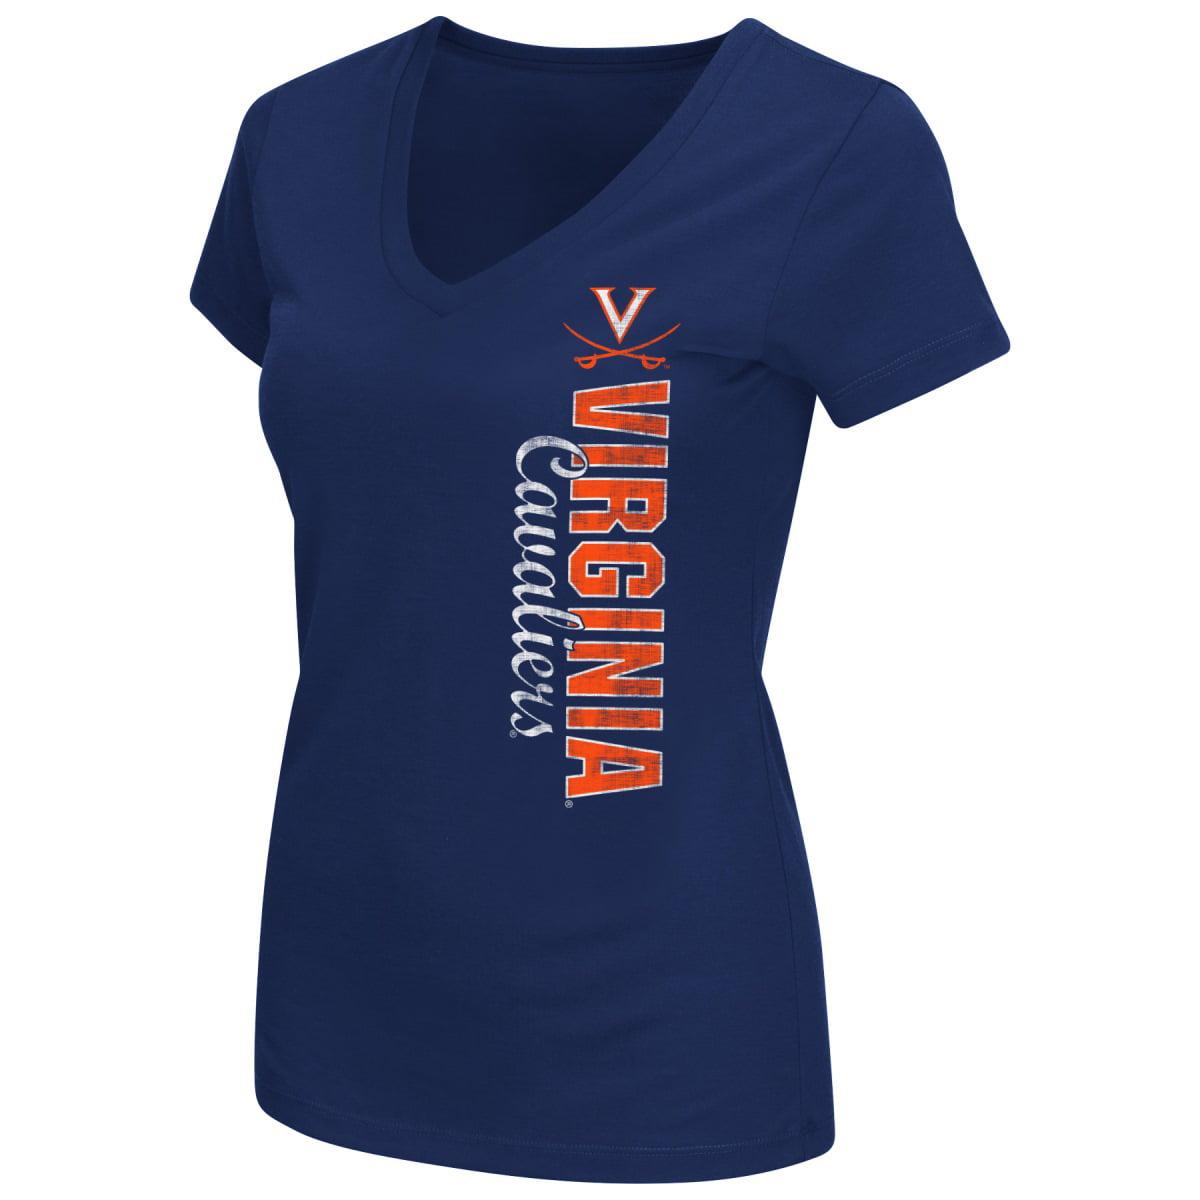 "Virginia Cavaliers Women's NCAA ""Compulsory"" Dual Blend Short Sleeve T-Shirt"